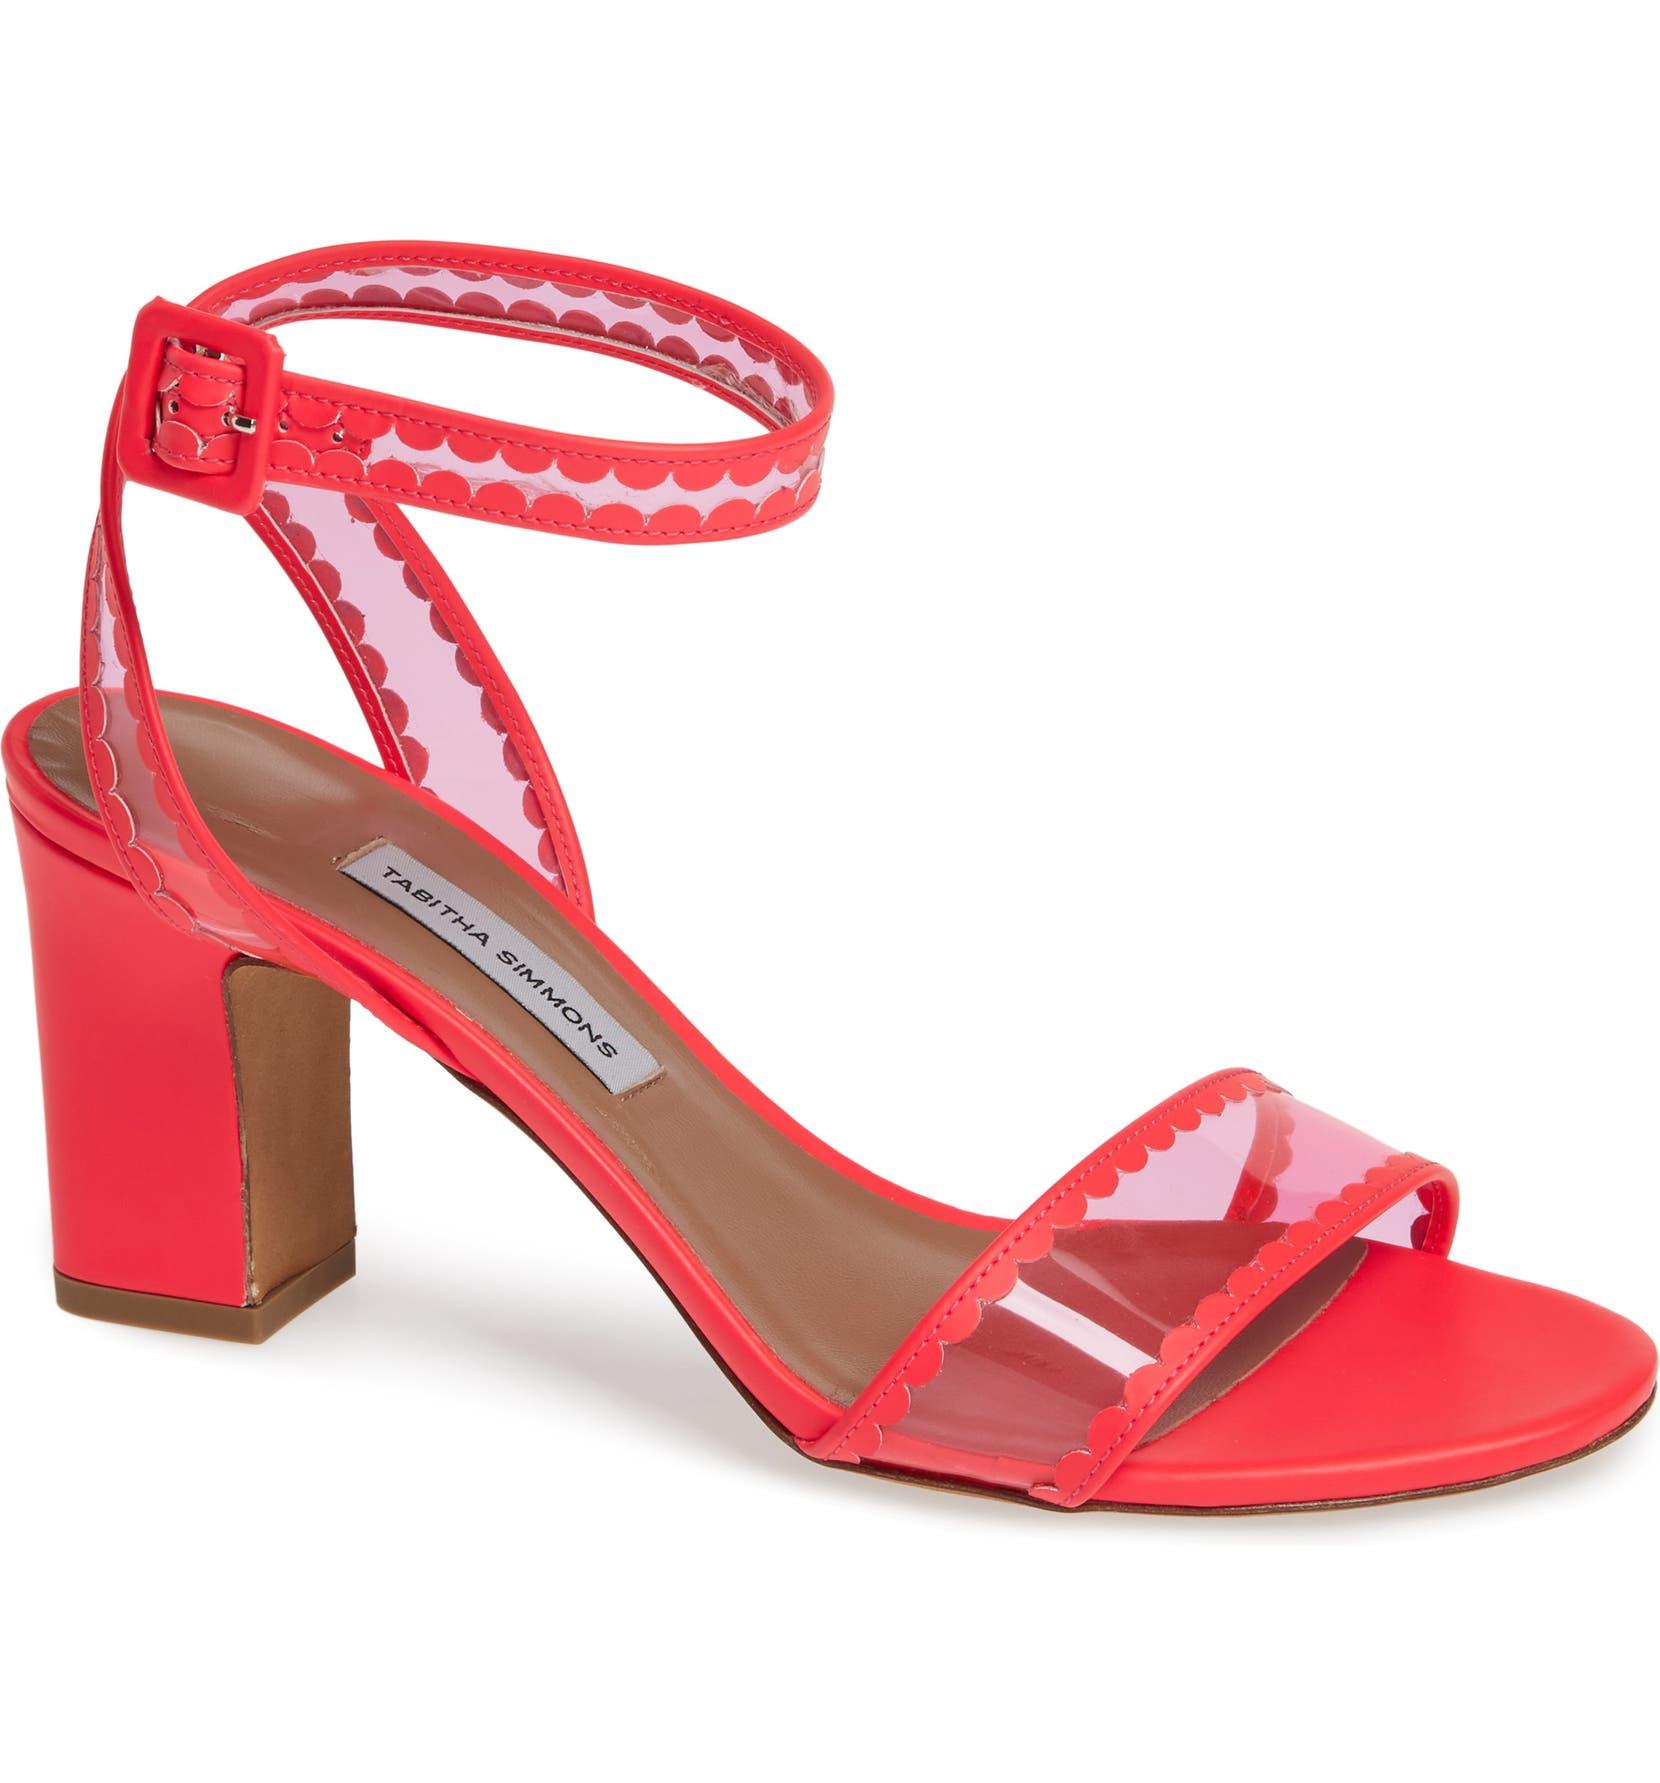 c64126ce8d64 Tabitha Simmons Leticia Clear Ankle Strap Sandal (Women)